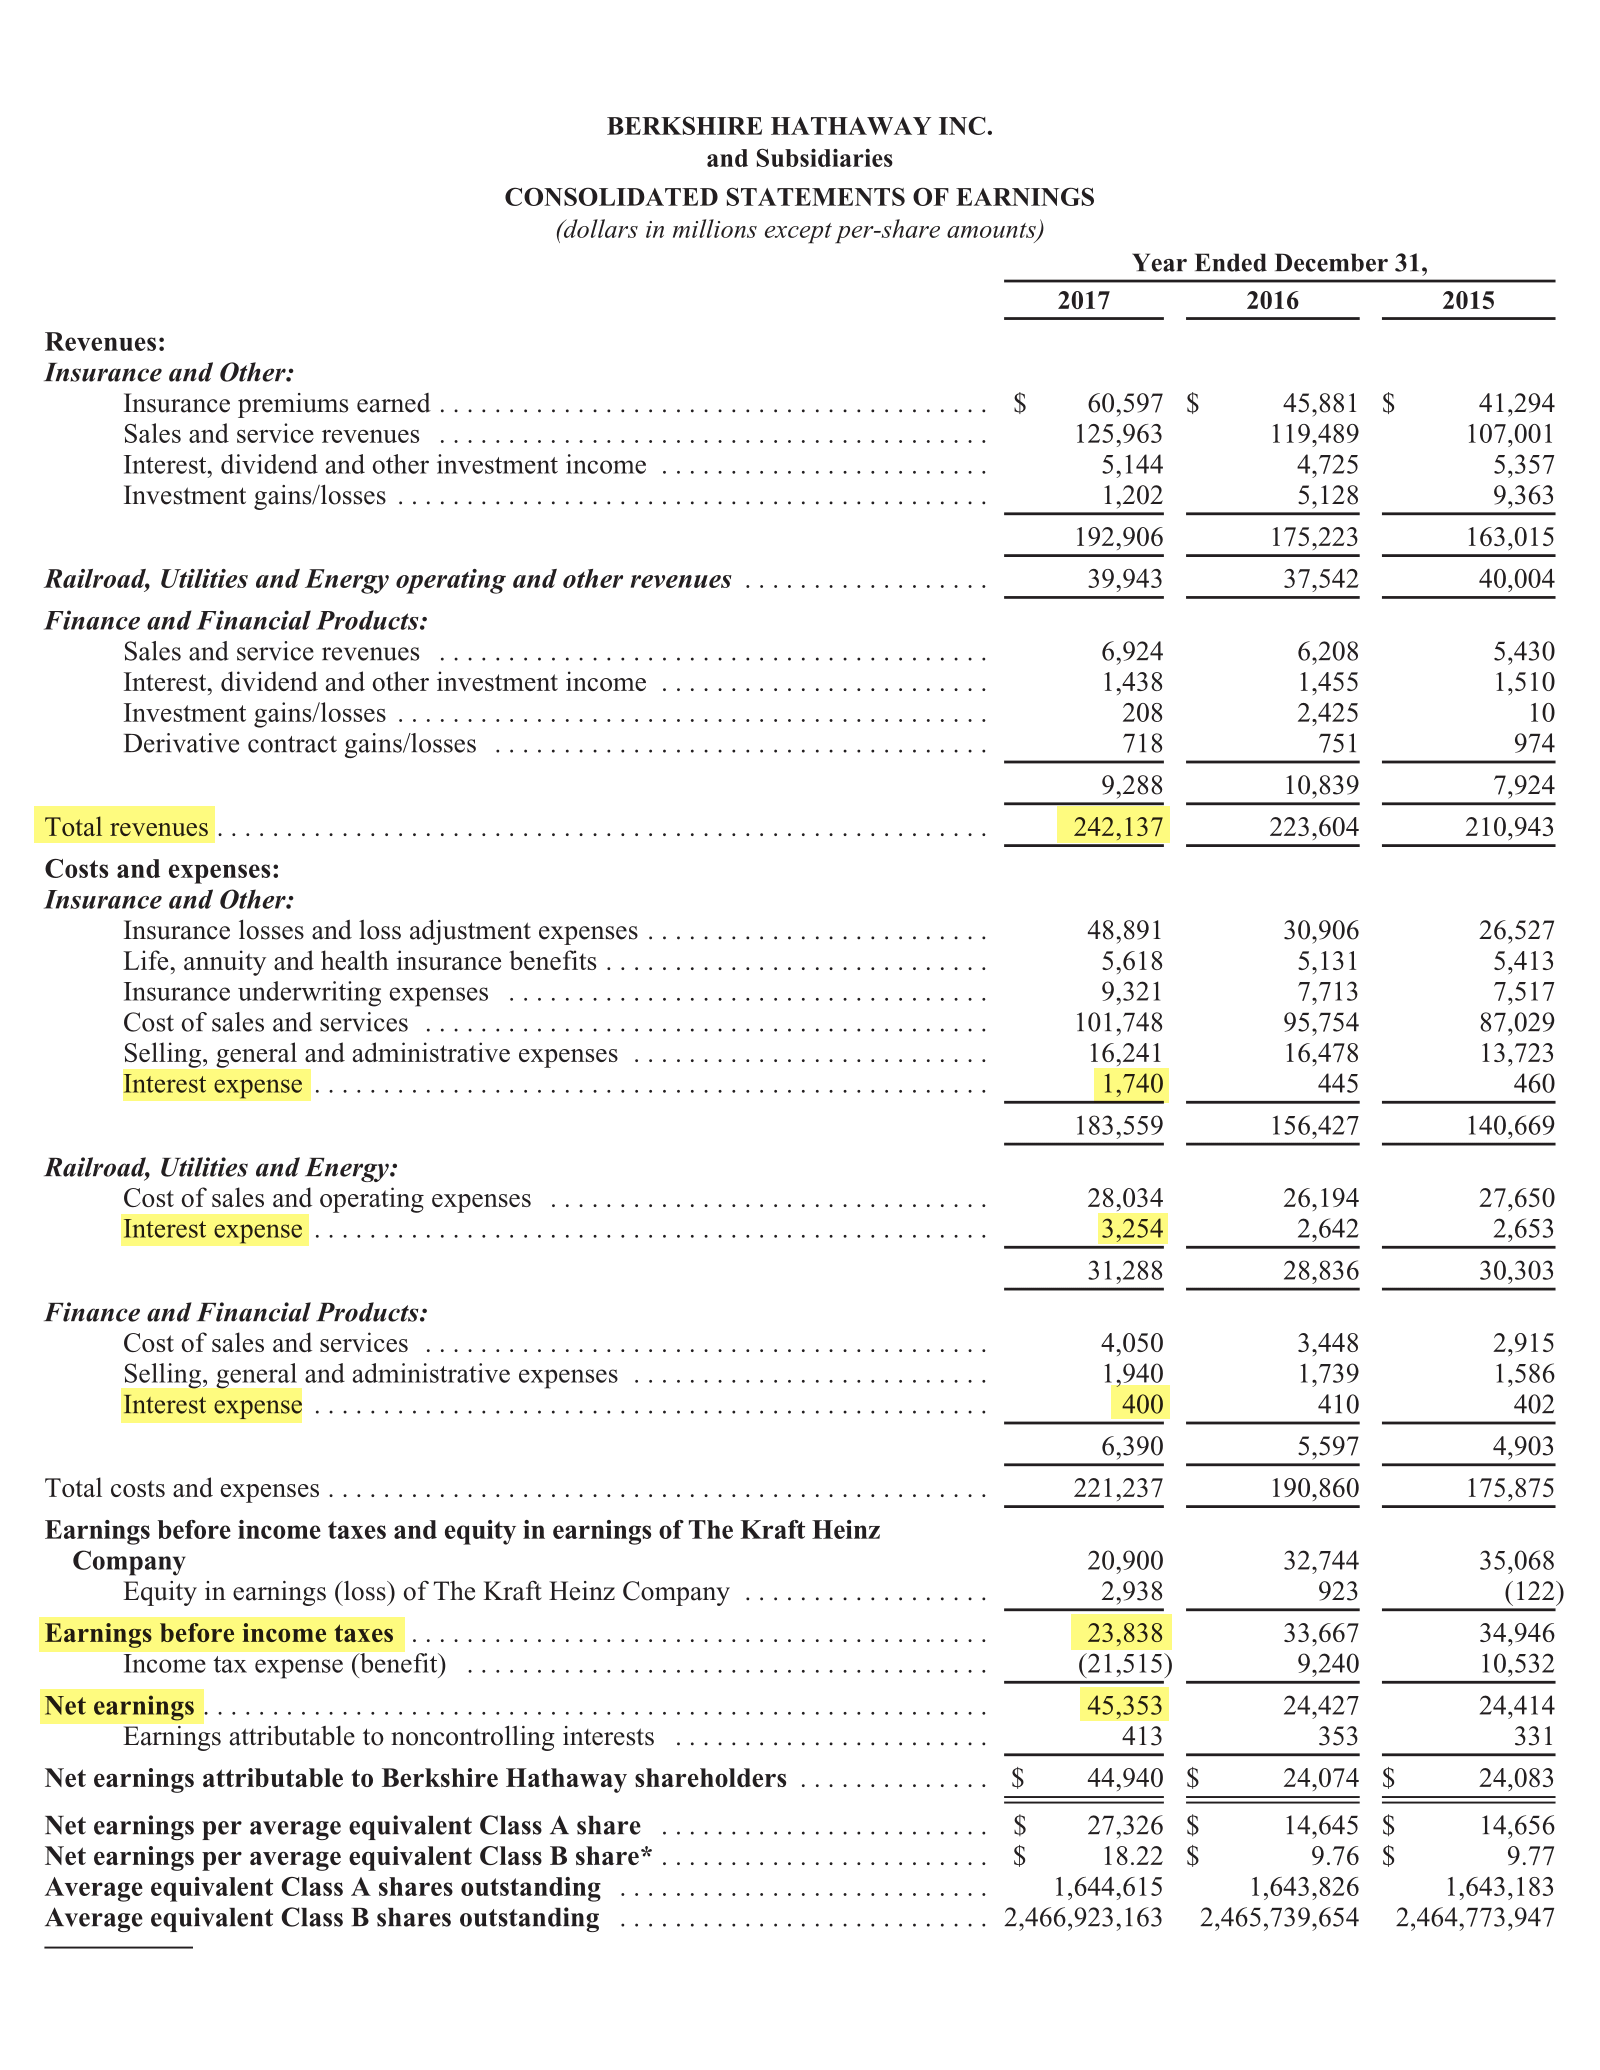 Страница 96 годового отчета Berkshire Hathaway за 2017 год